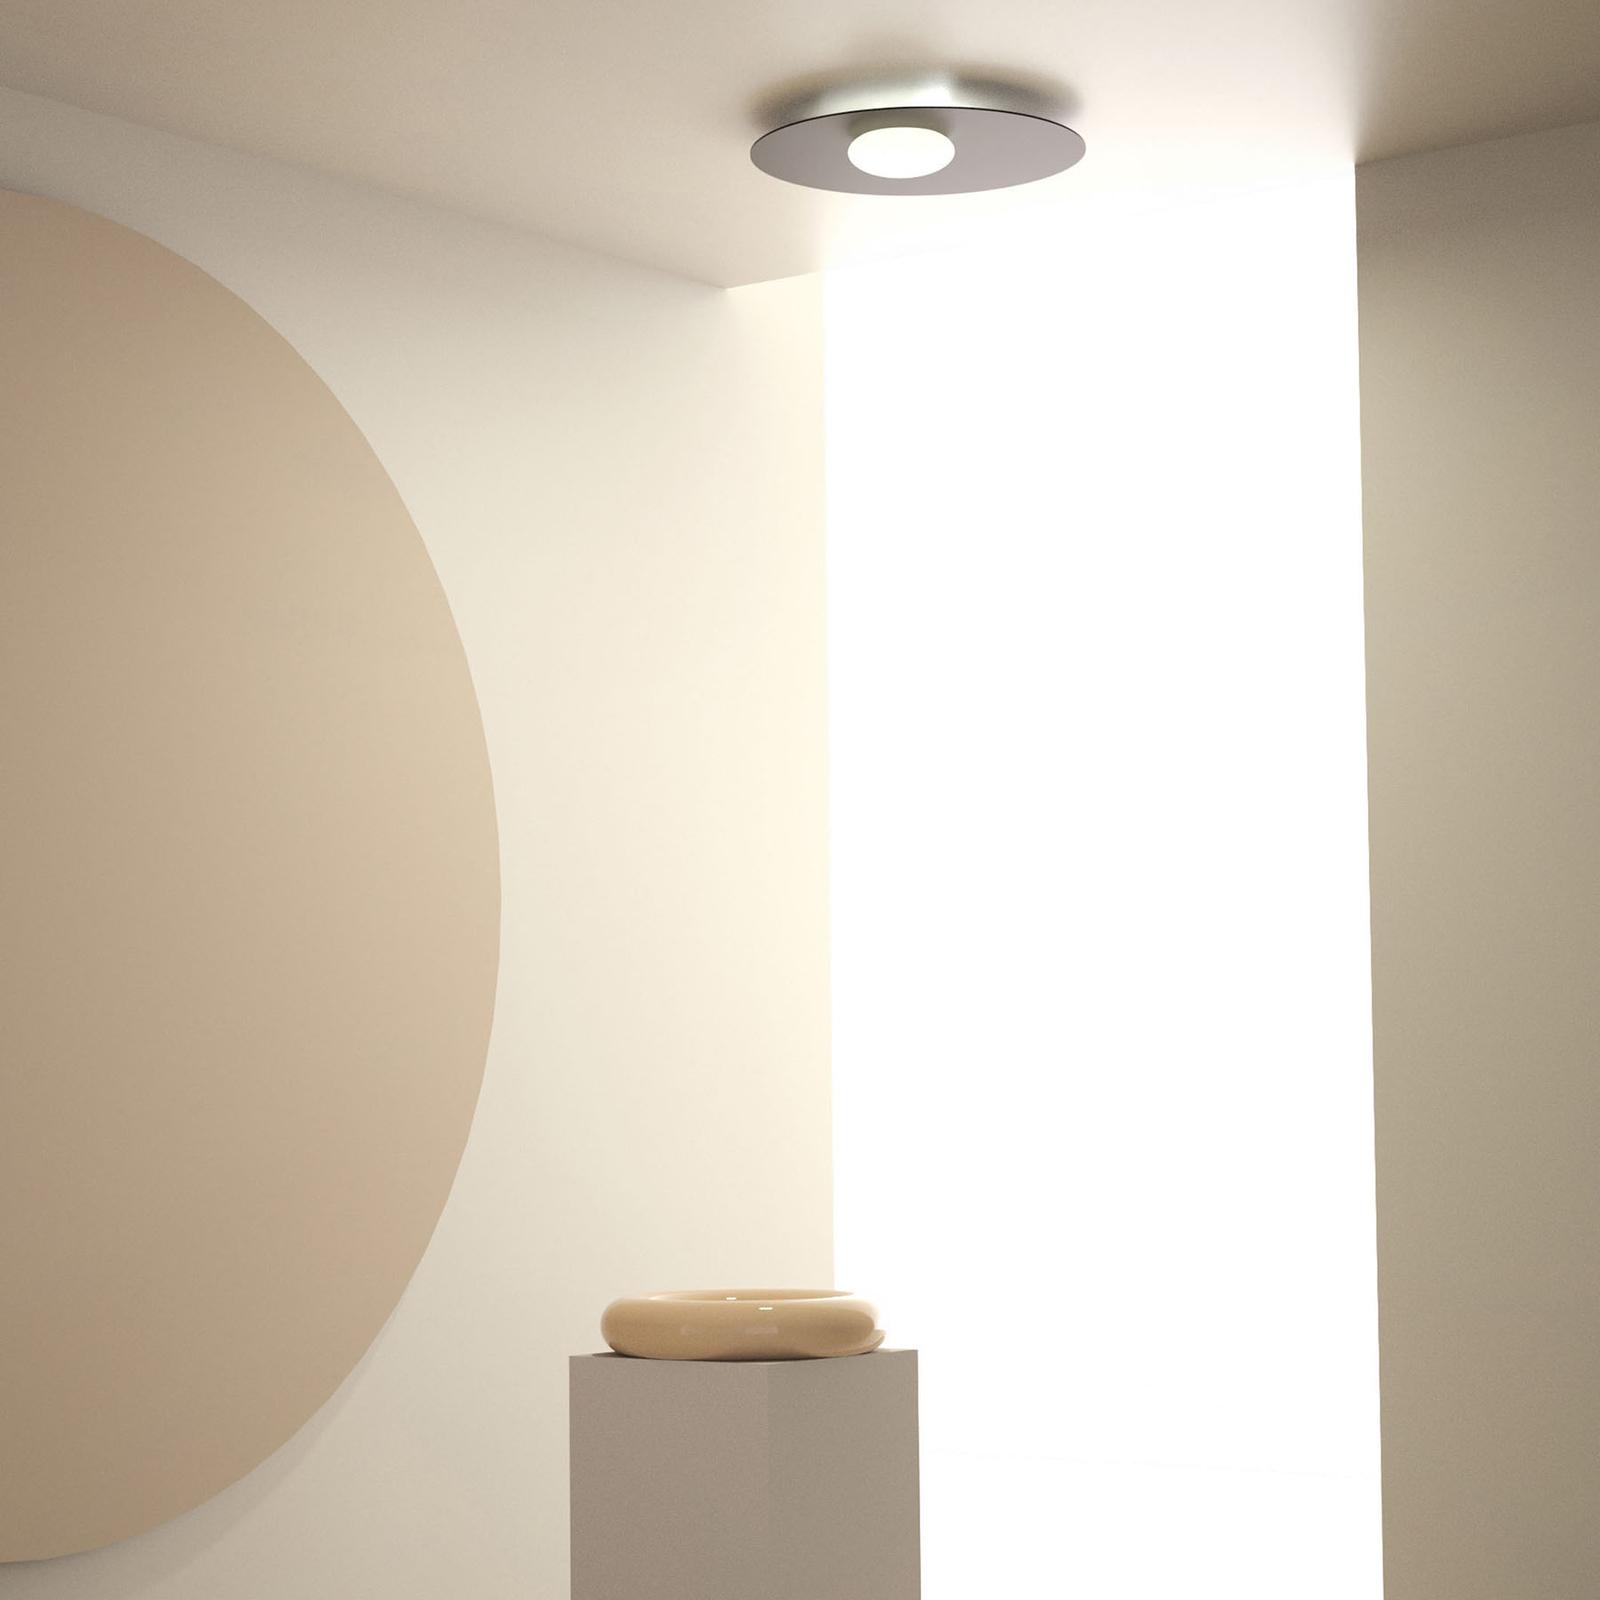 Axolight Kwic lampa sufitowa LED, czarna Ø48cm